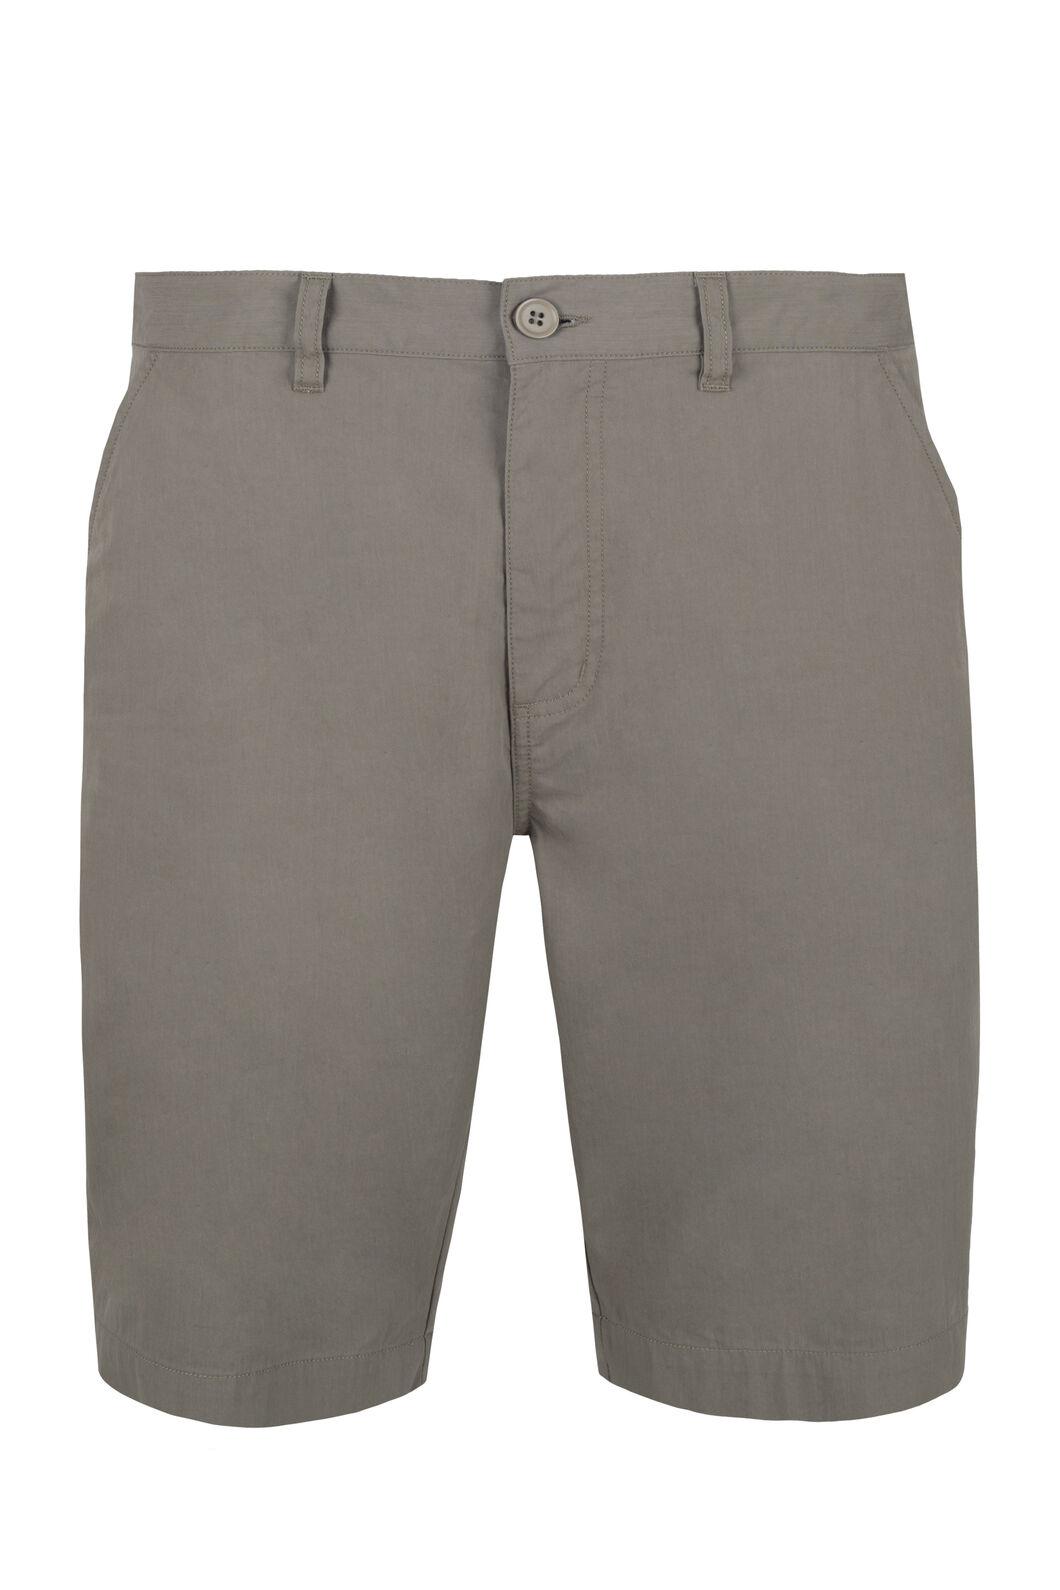 Macpac Kelburn Shorts - Men's, Lead Grey, hi-res